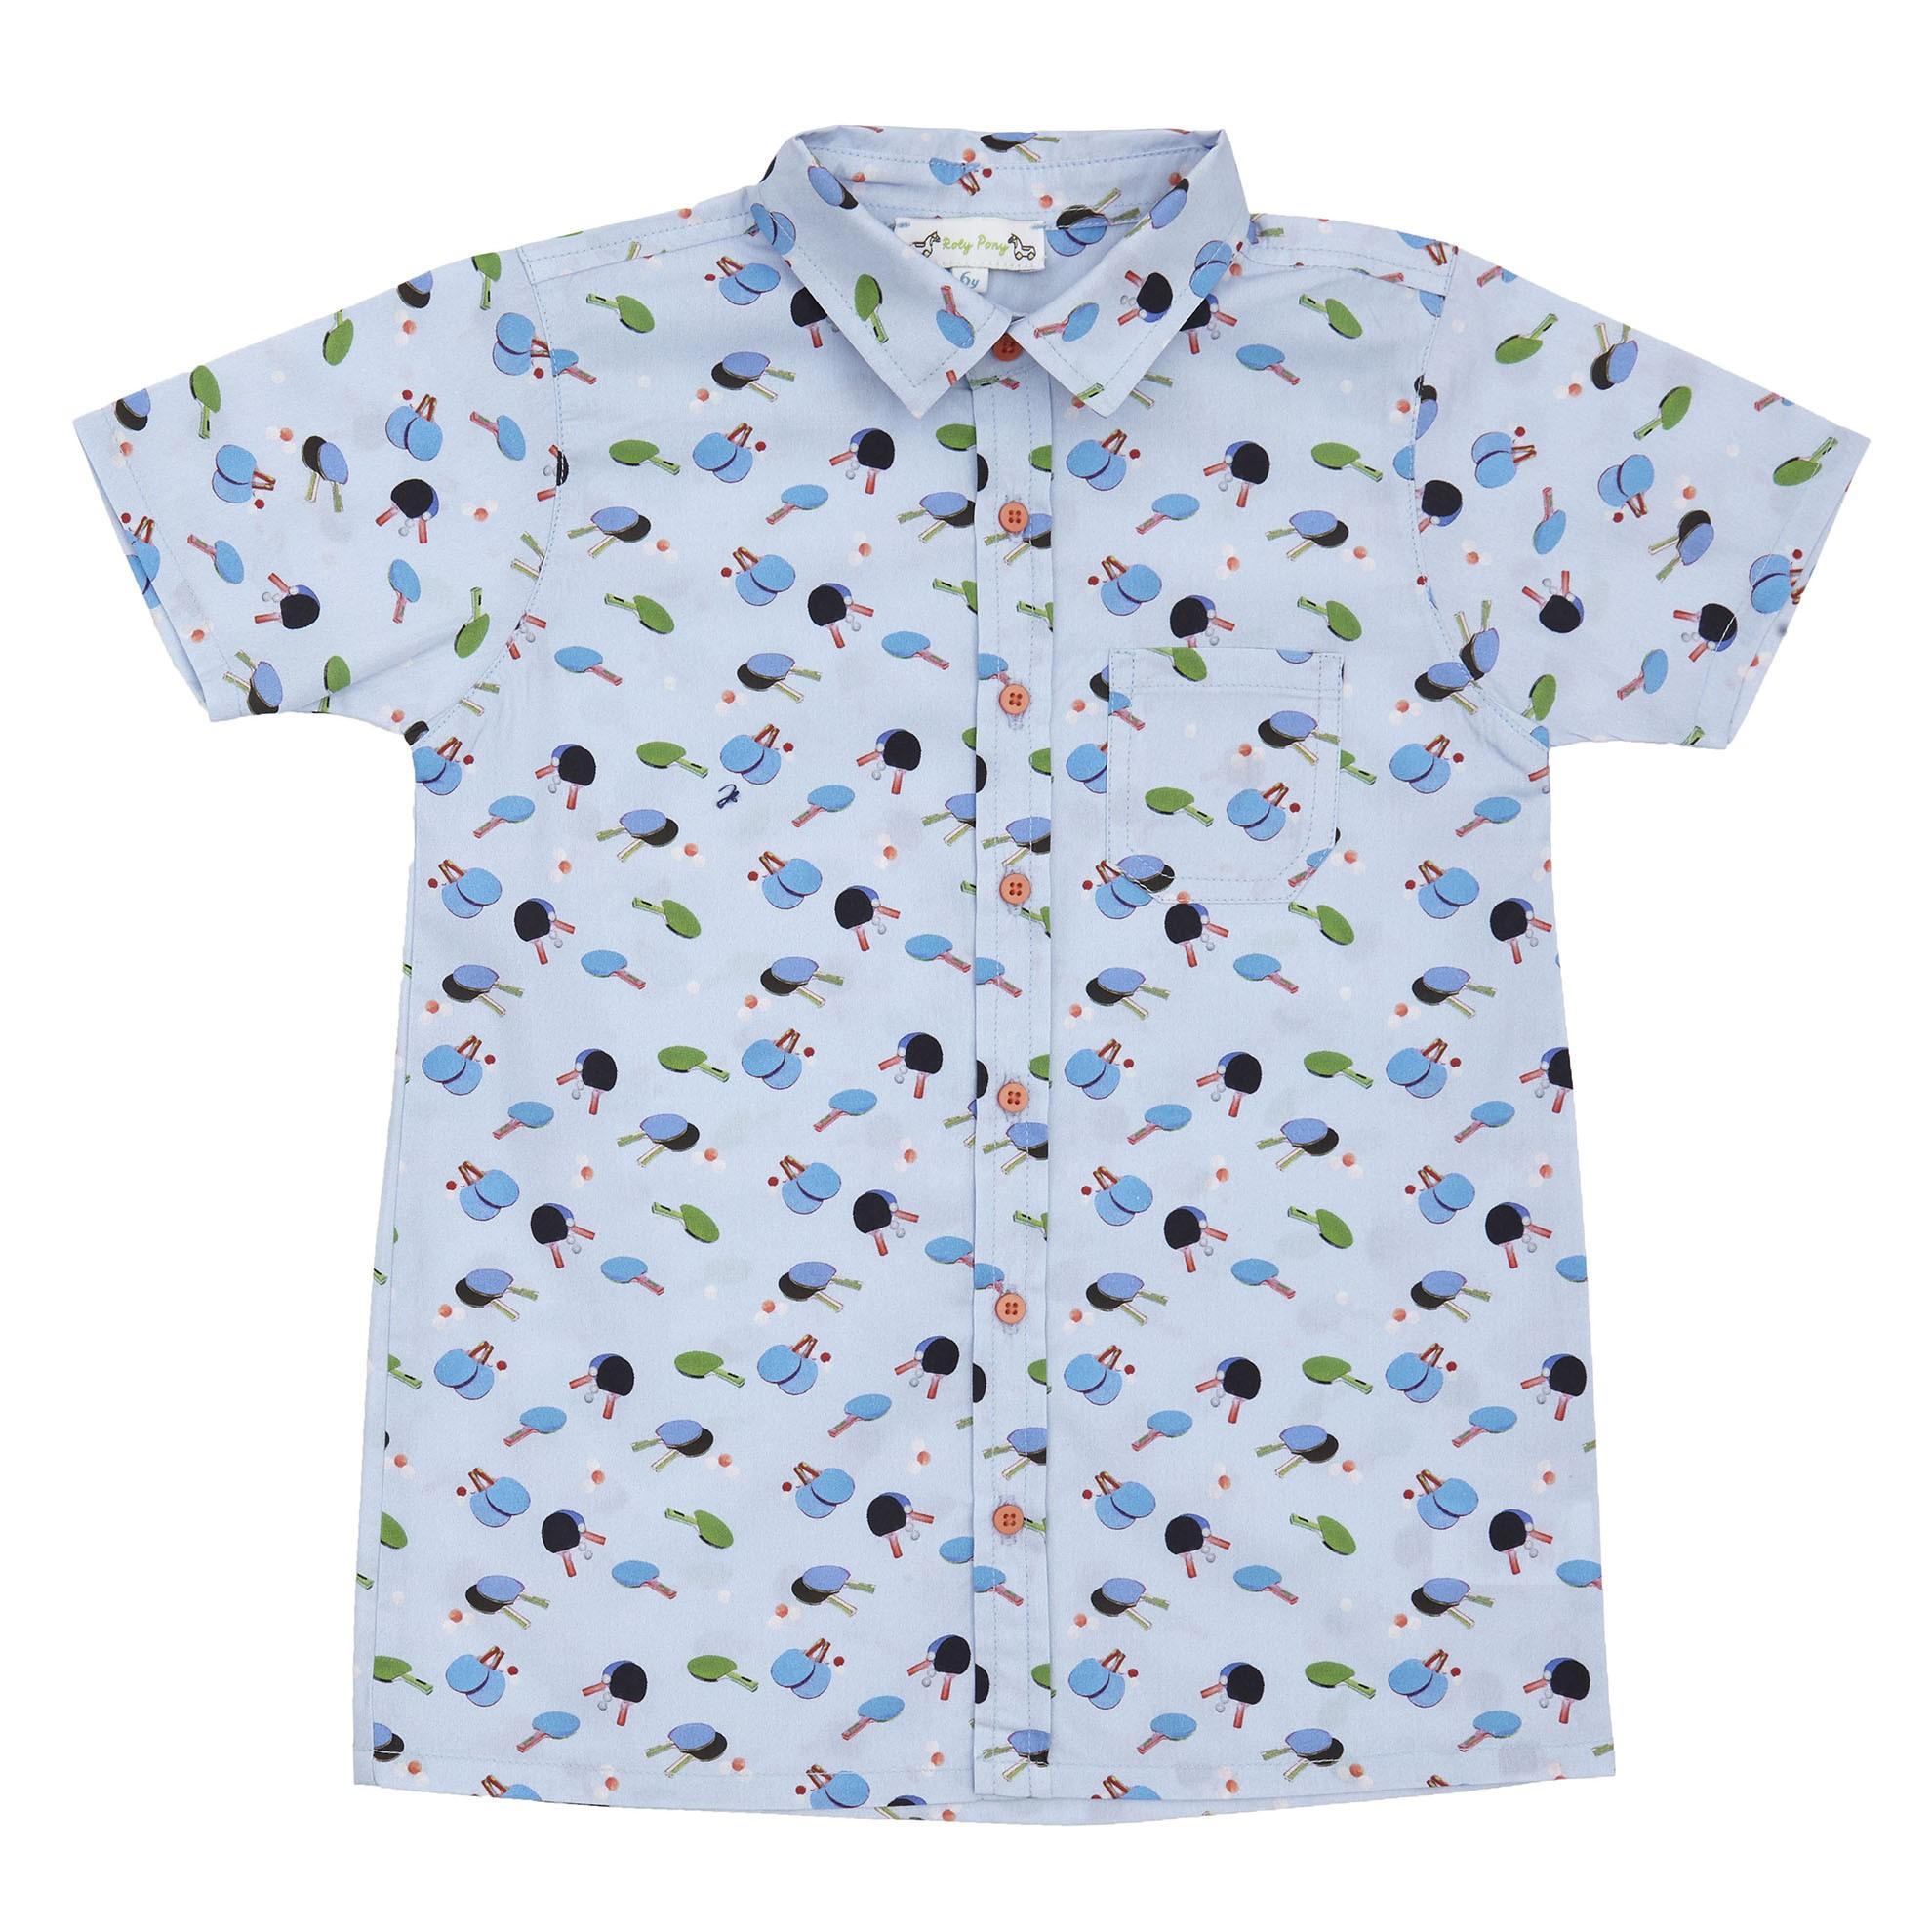 ROLY PONY 乒乓球襯衫